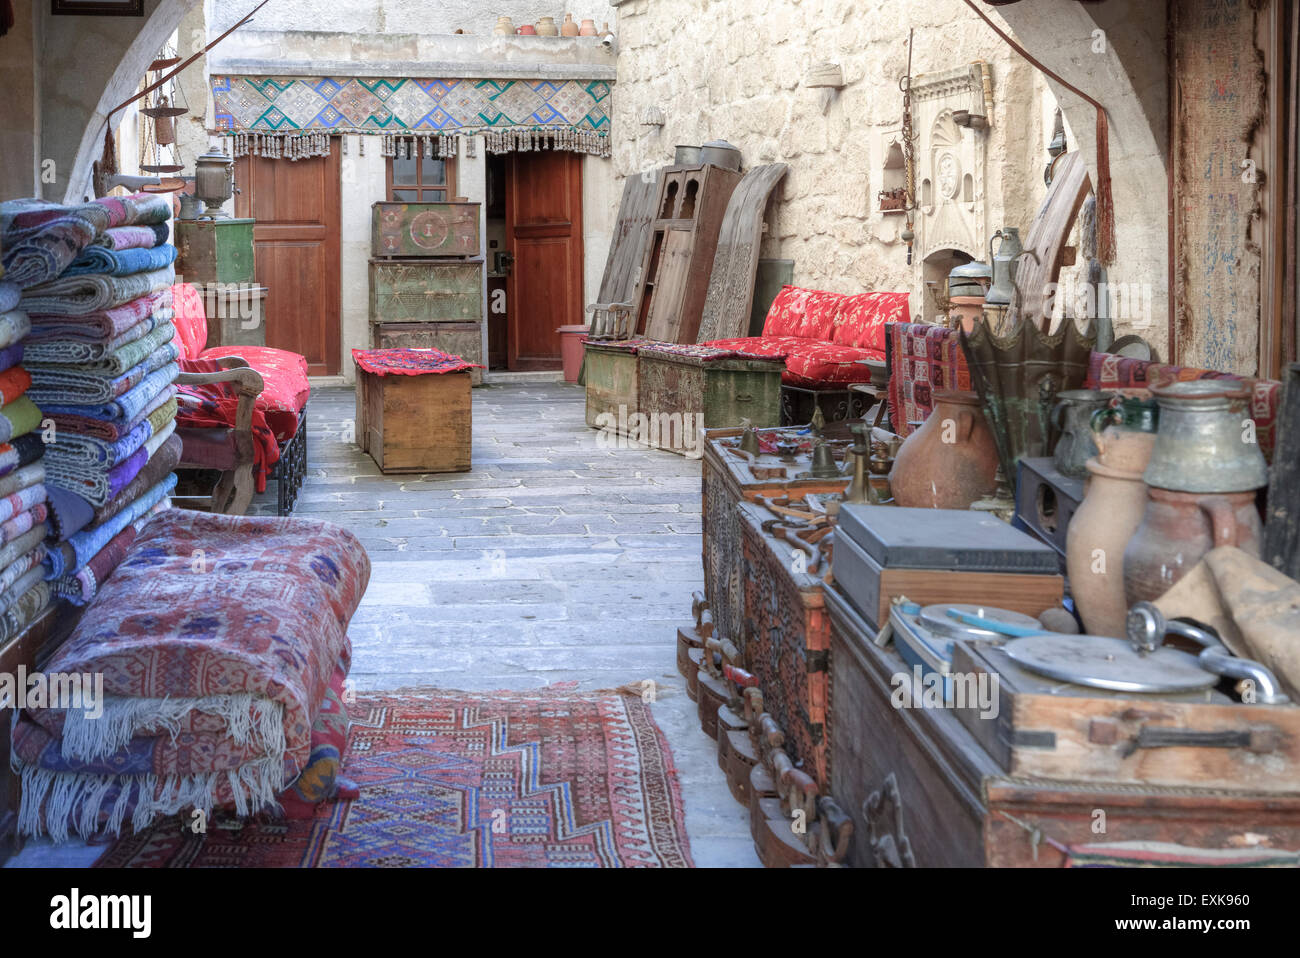 Türkische Teppichgeschäft in Göreme, Kappadokien, Anatolien, Türkei Stockbild